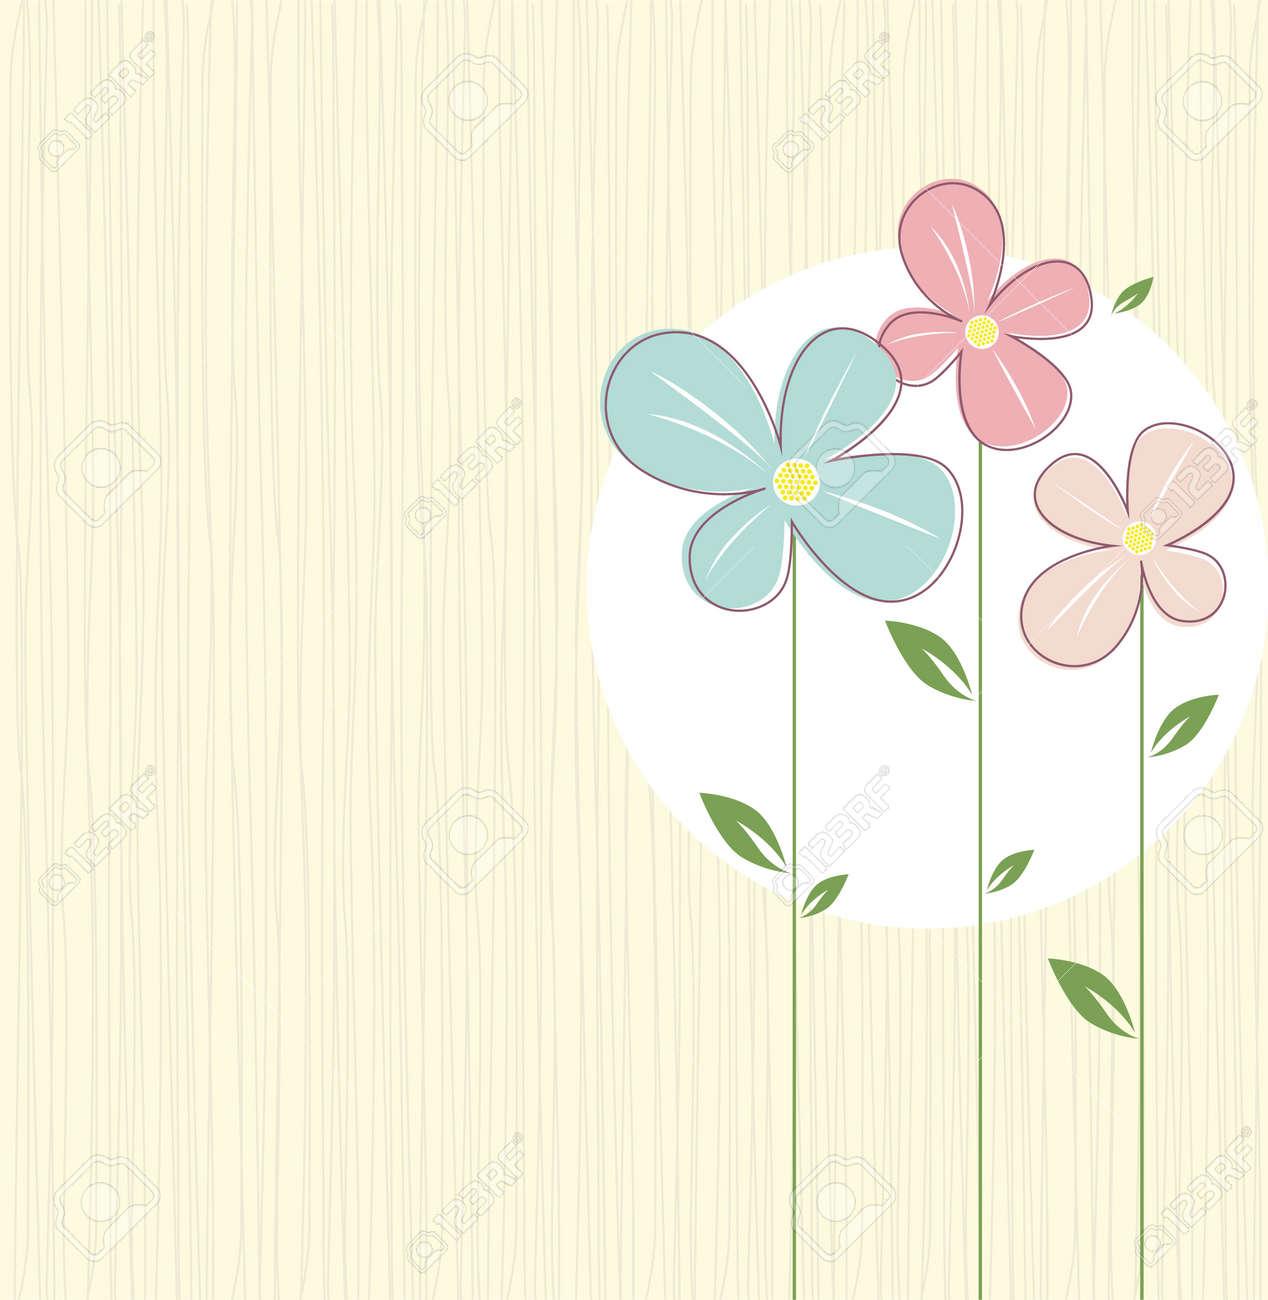 Spring Flowers Stock Vector - 8852861